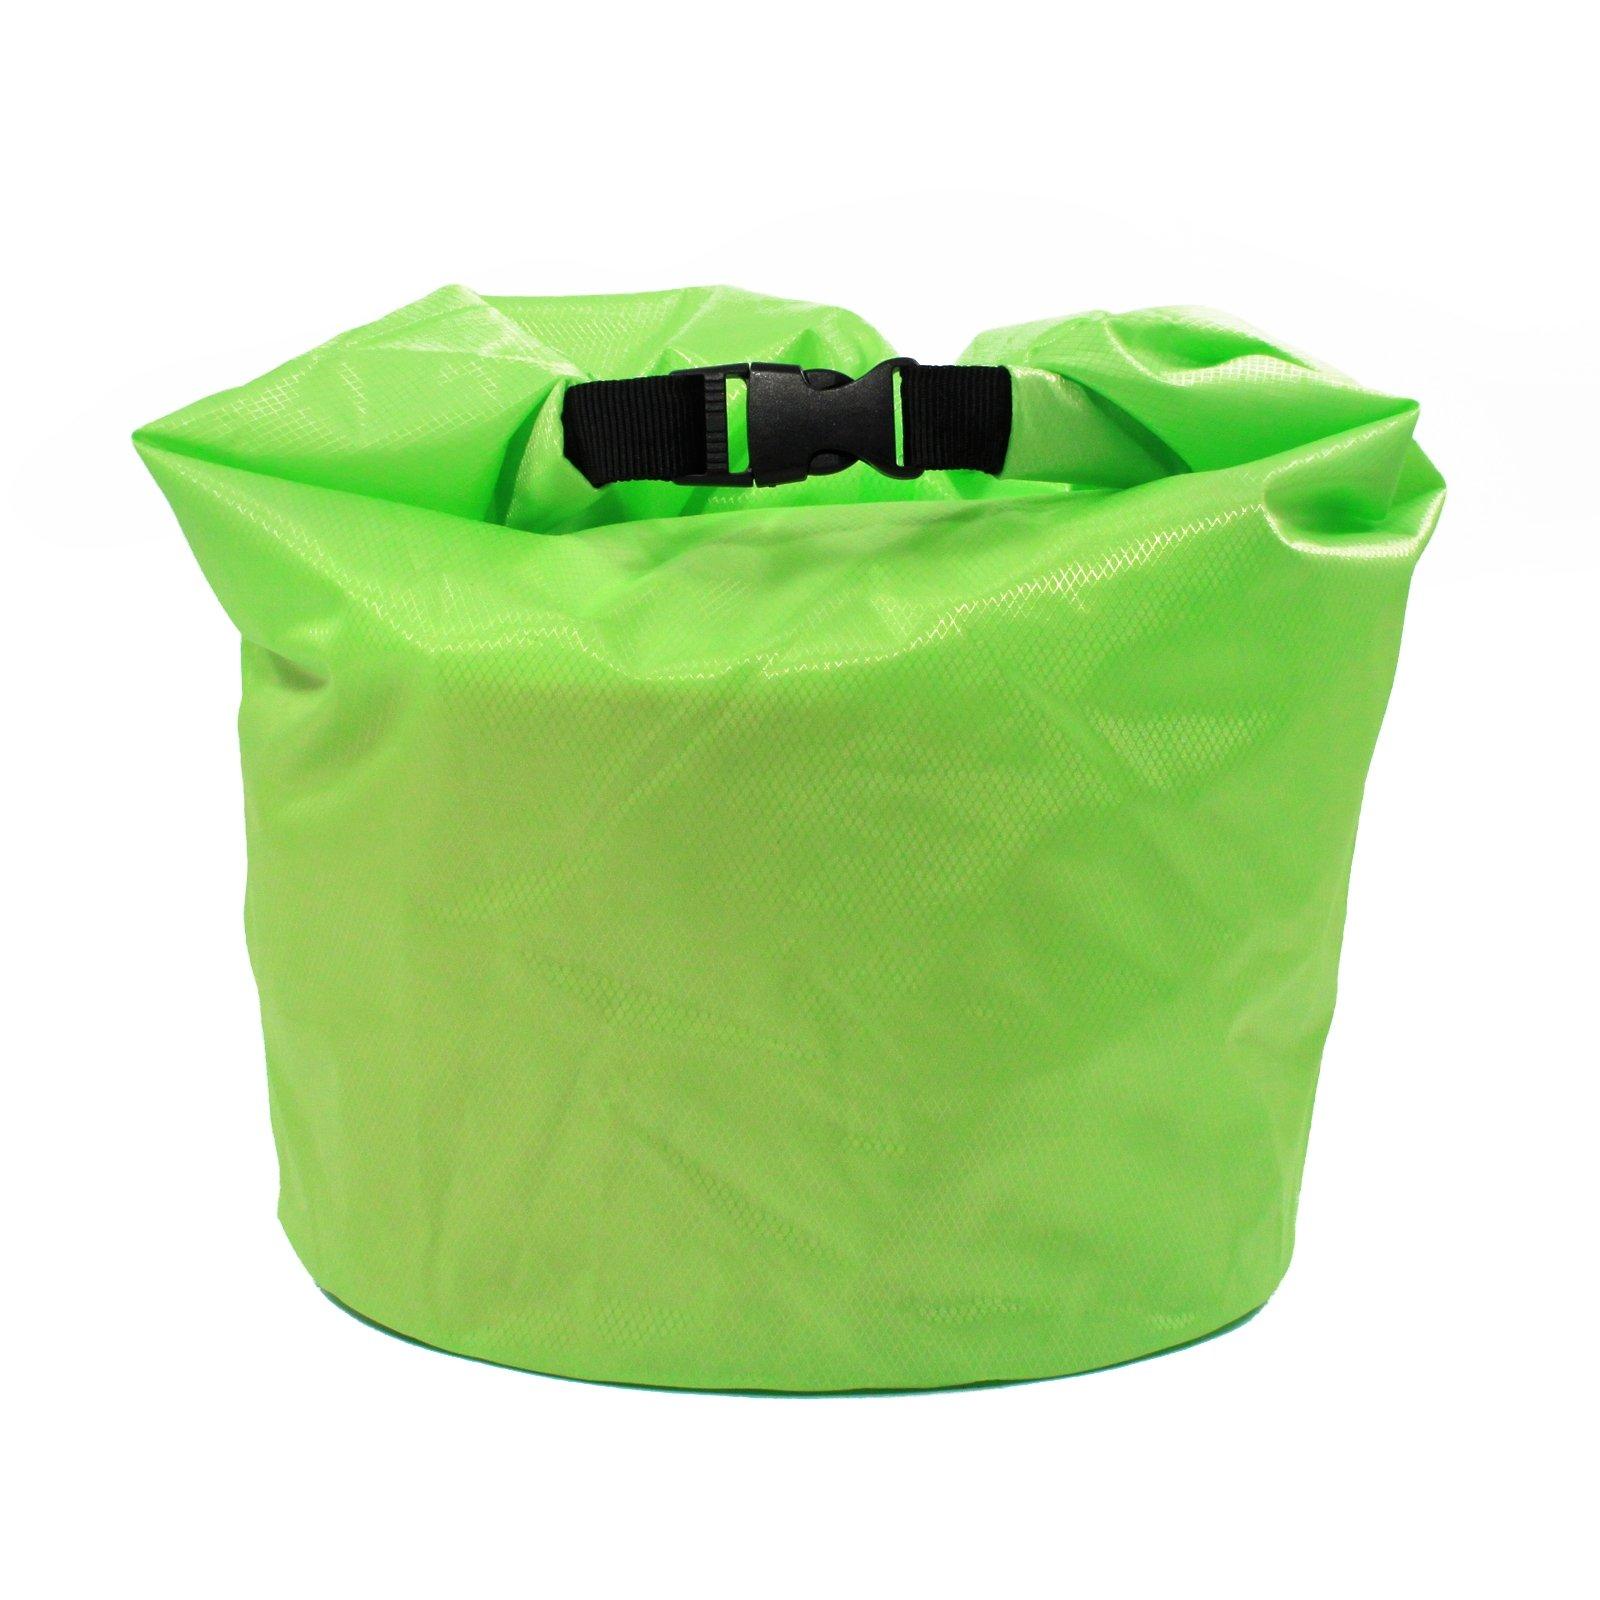 ASR Outdoor Dry Sack 10L Water Resistant 9 Inch Diamater 210T Terylene Material